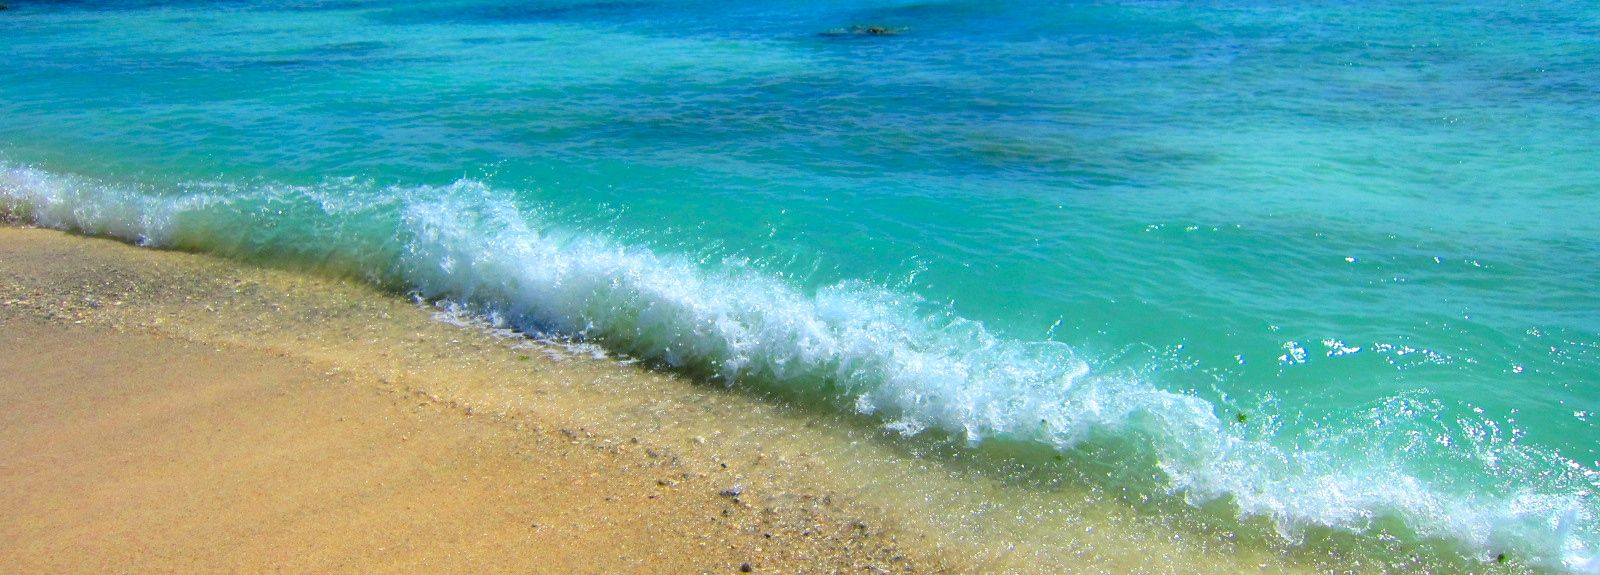 Oranjestad, Aruba (AUA-Queen Beatrix Intl.)